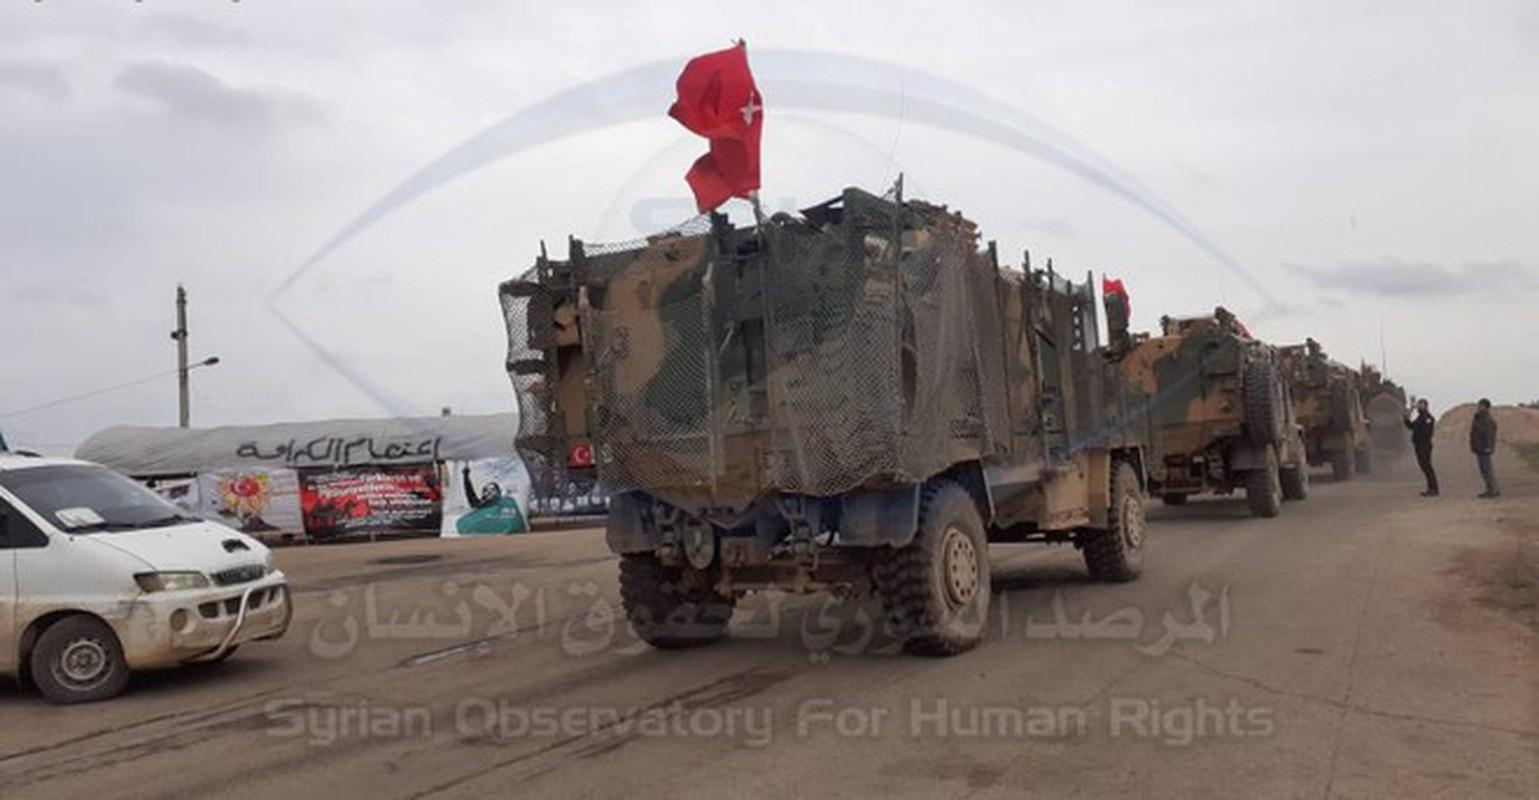 Phien quan khong chiu rut khoi cao toc M4 va the kho cua Tho Nhi Ky o Syria-Hinh-6